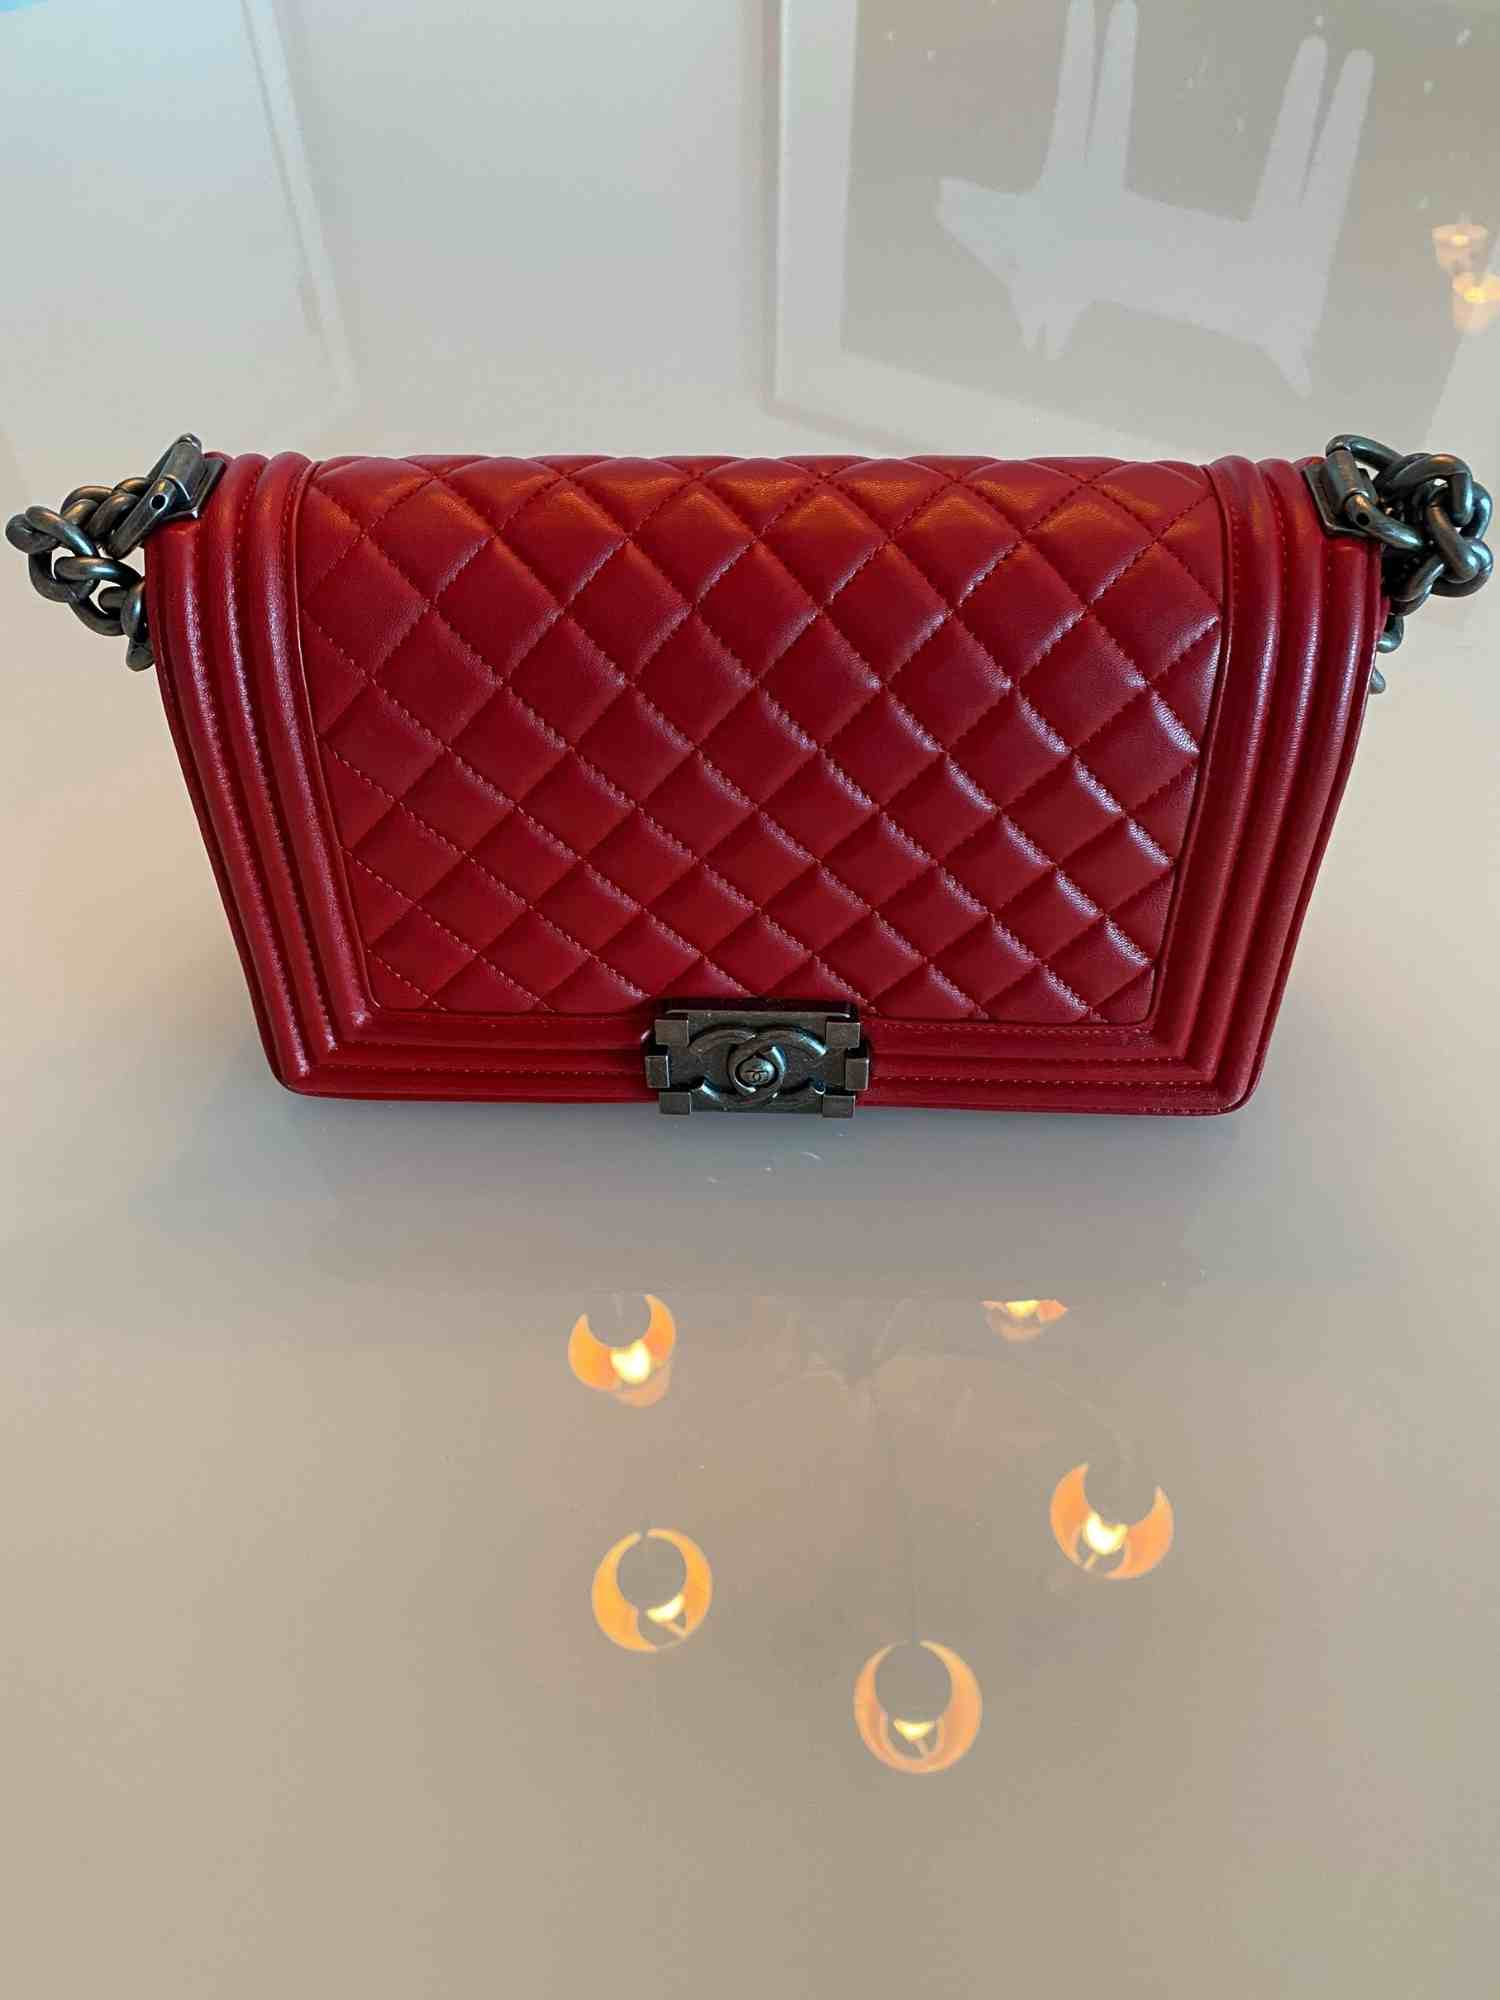 Bolsa Chanel Boy Vermelha